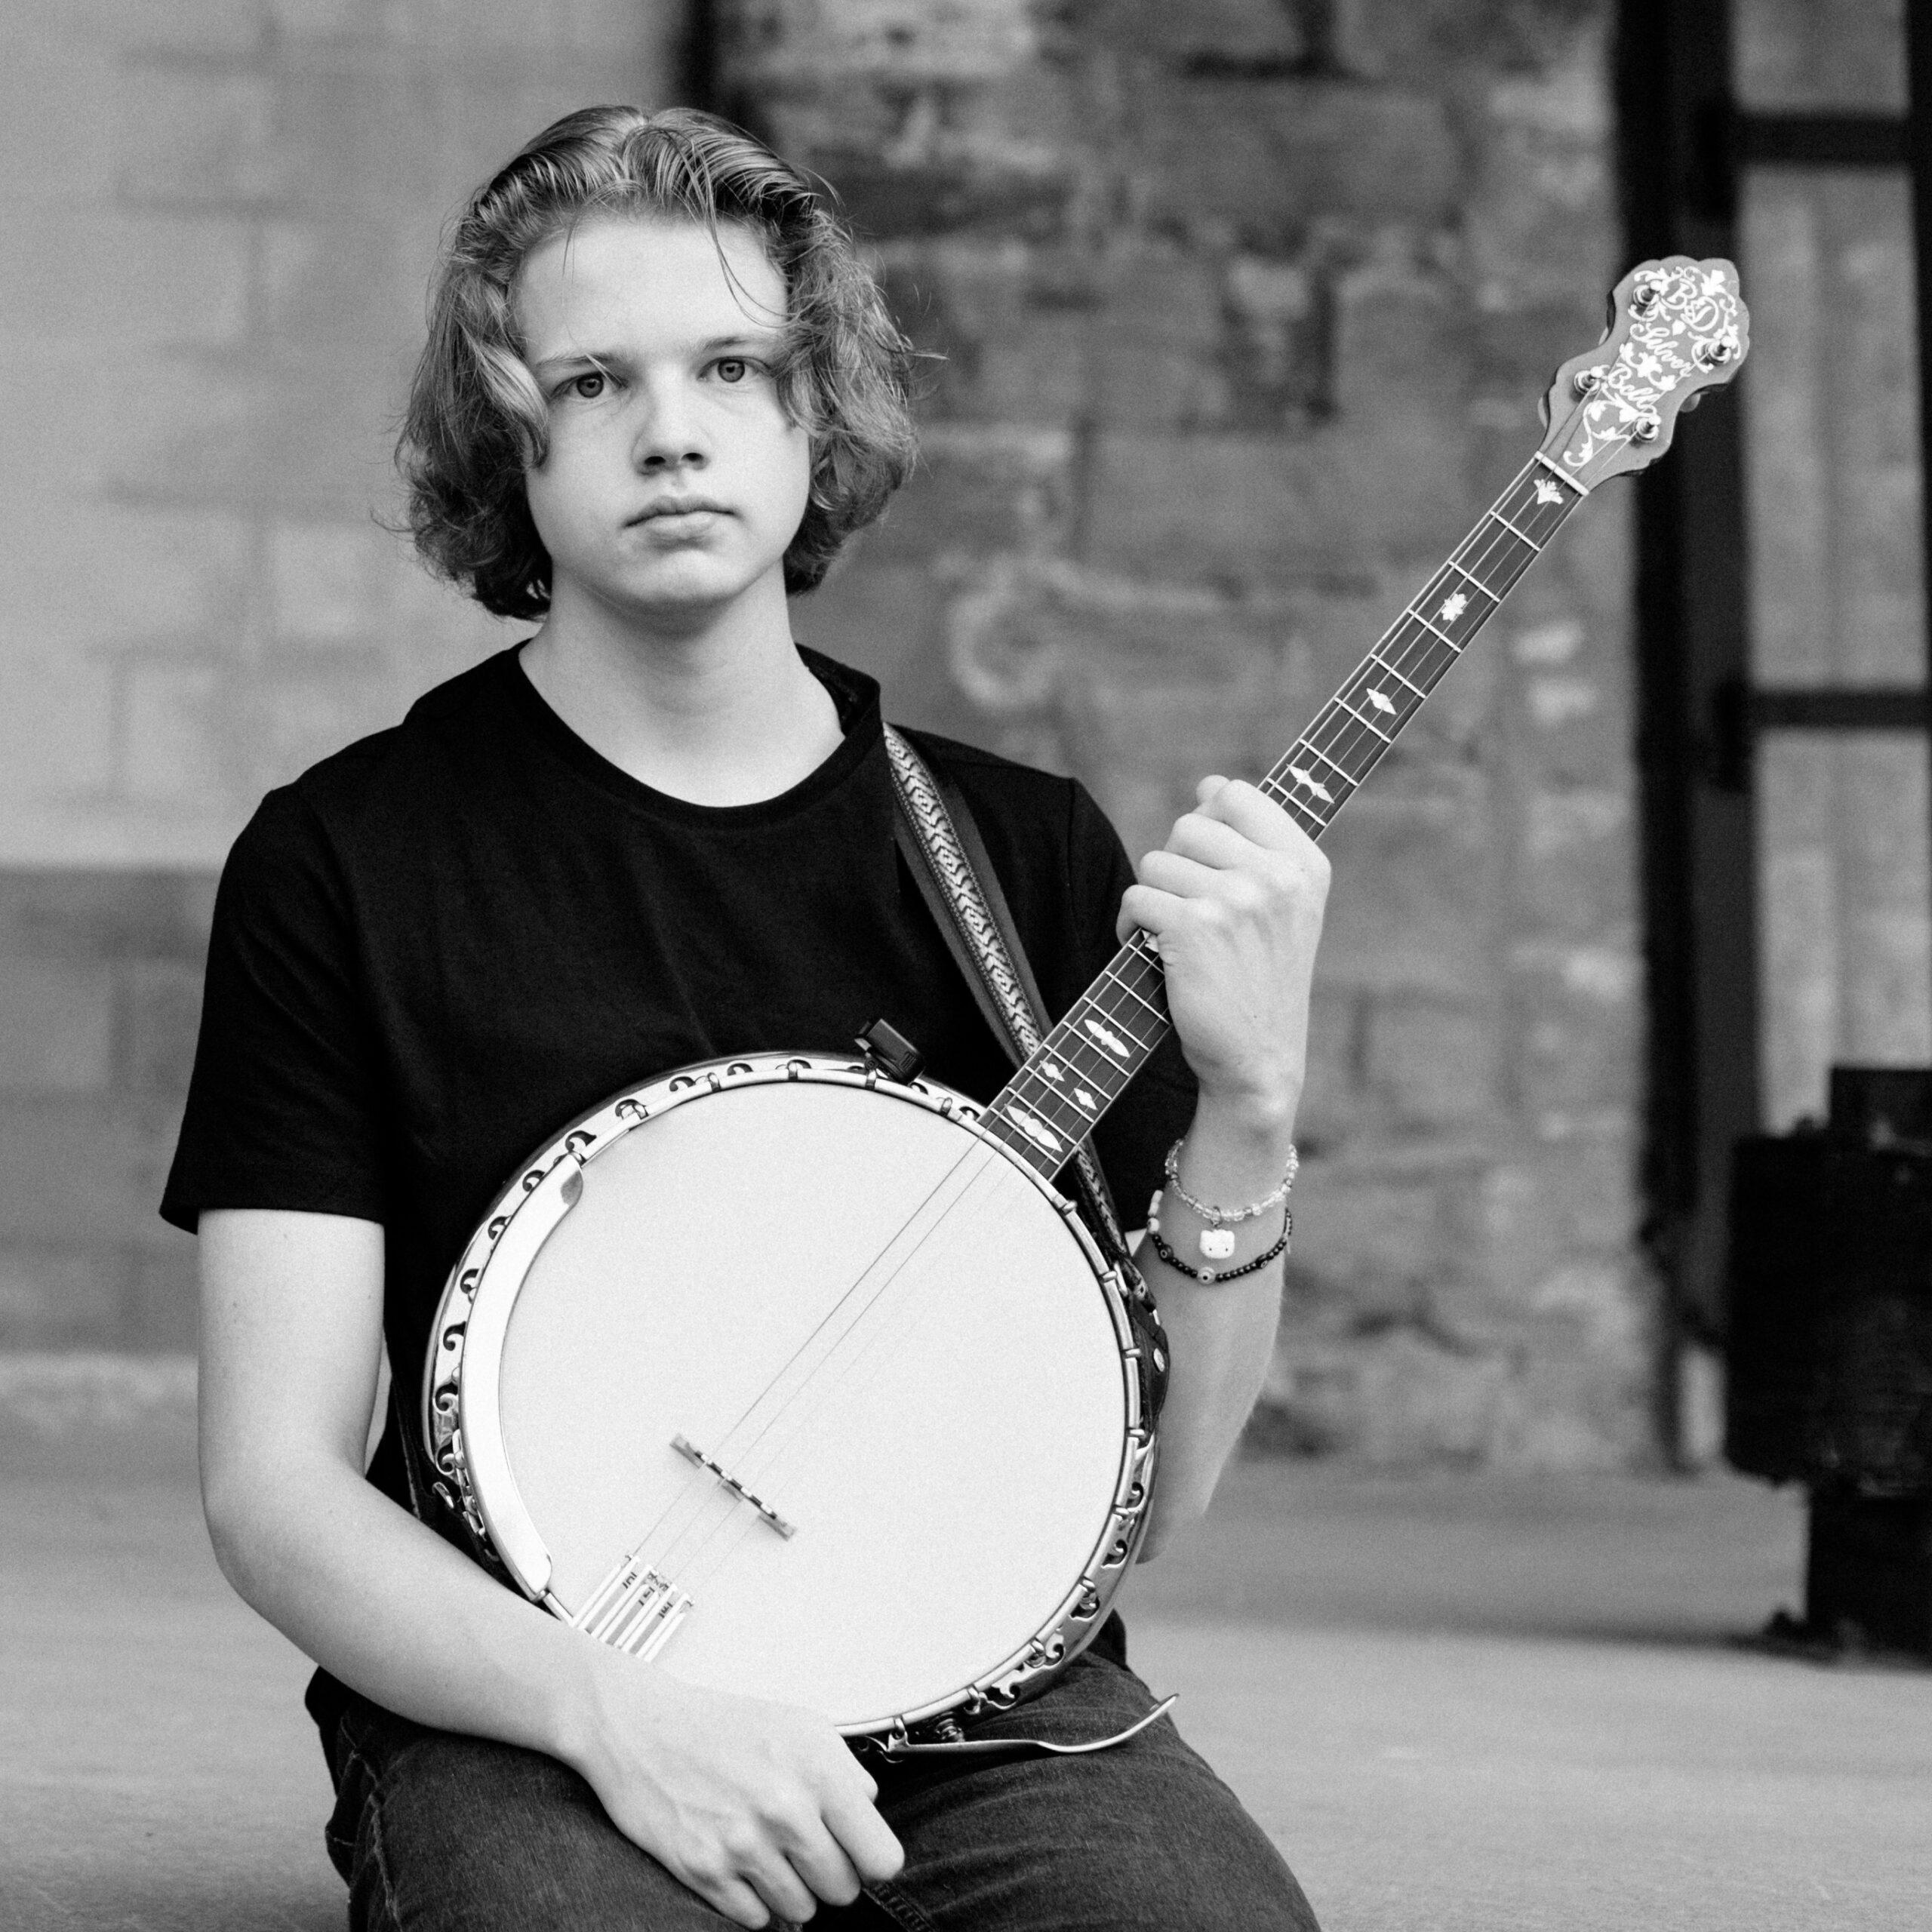 Promo shot of Morien McBurnie with banjo